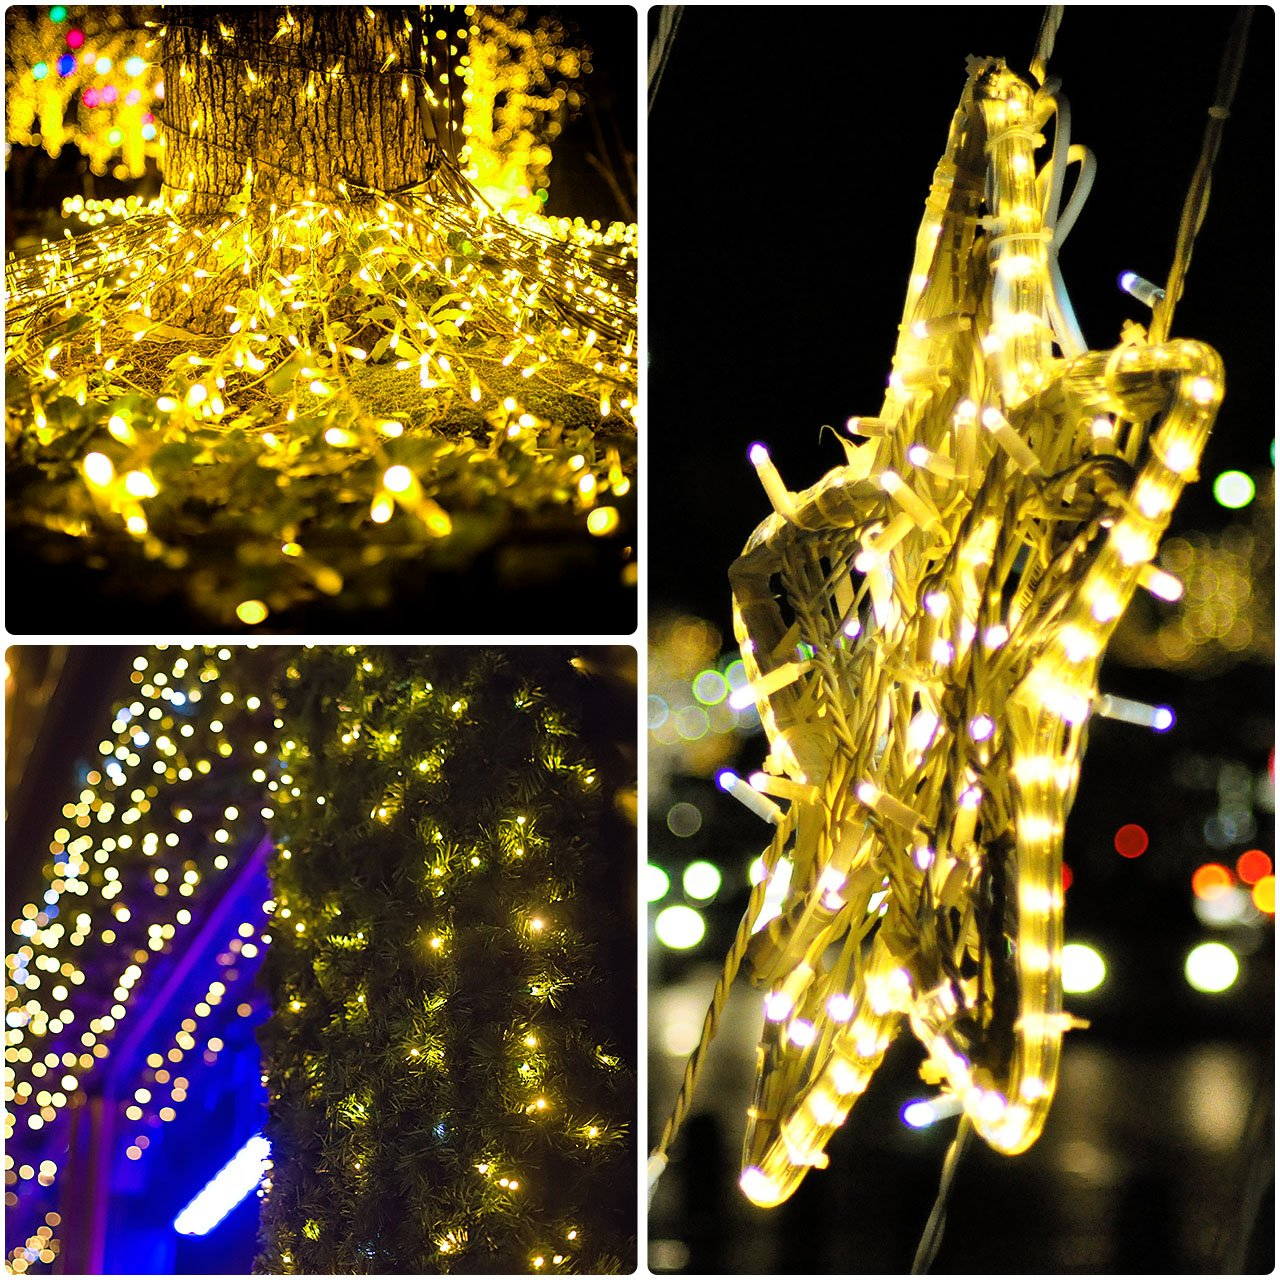 Mpow Solar String Lights 33ft 100led Outdoor Dancingledchristmaslightcircuit Waterproof Decorative For Patio Garden Gate Yard Party Wedding